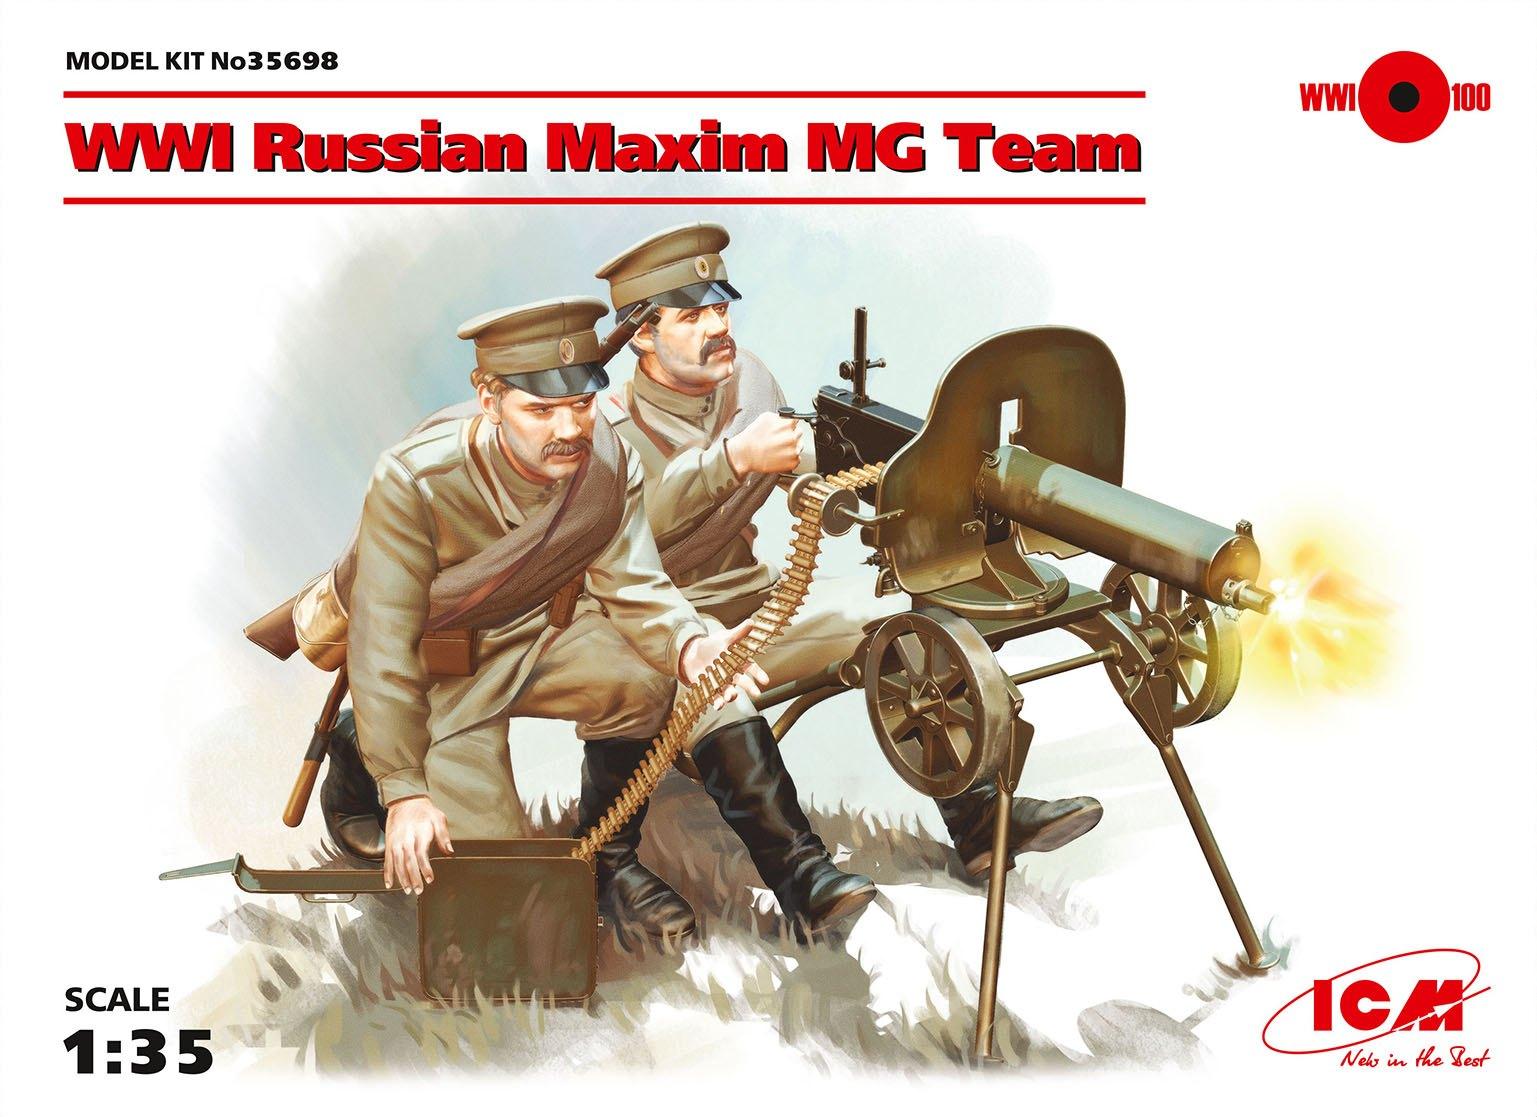 ICM 1/35 WWI Russian Maxim MG Team (2 figures)